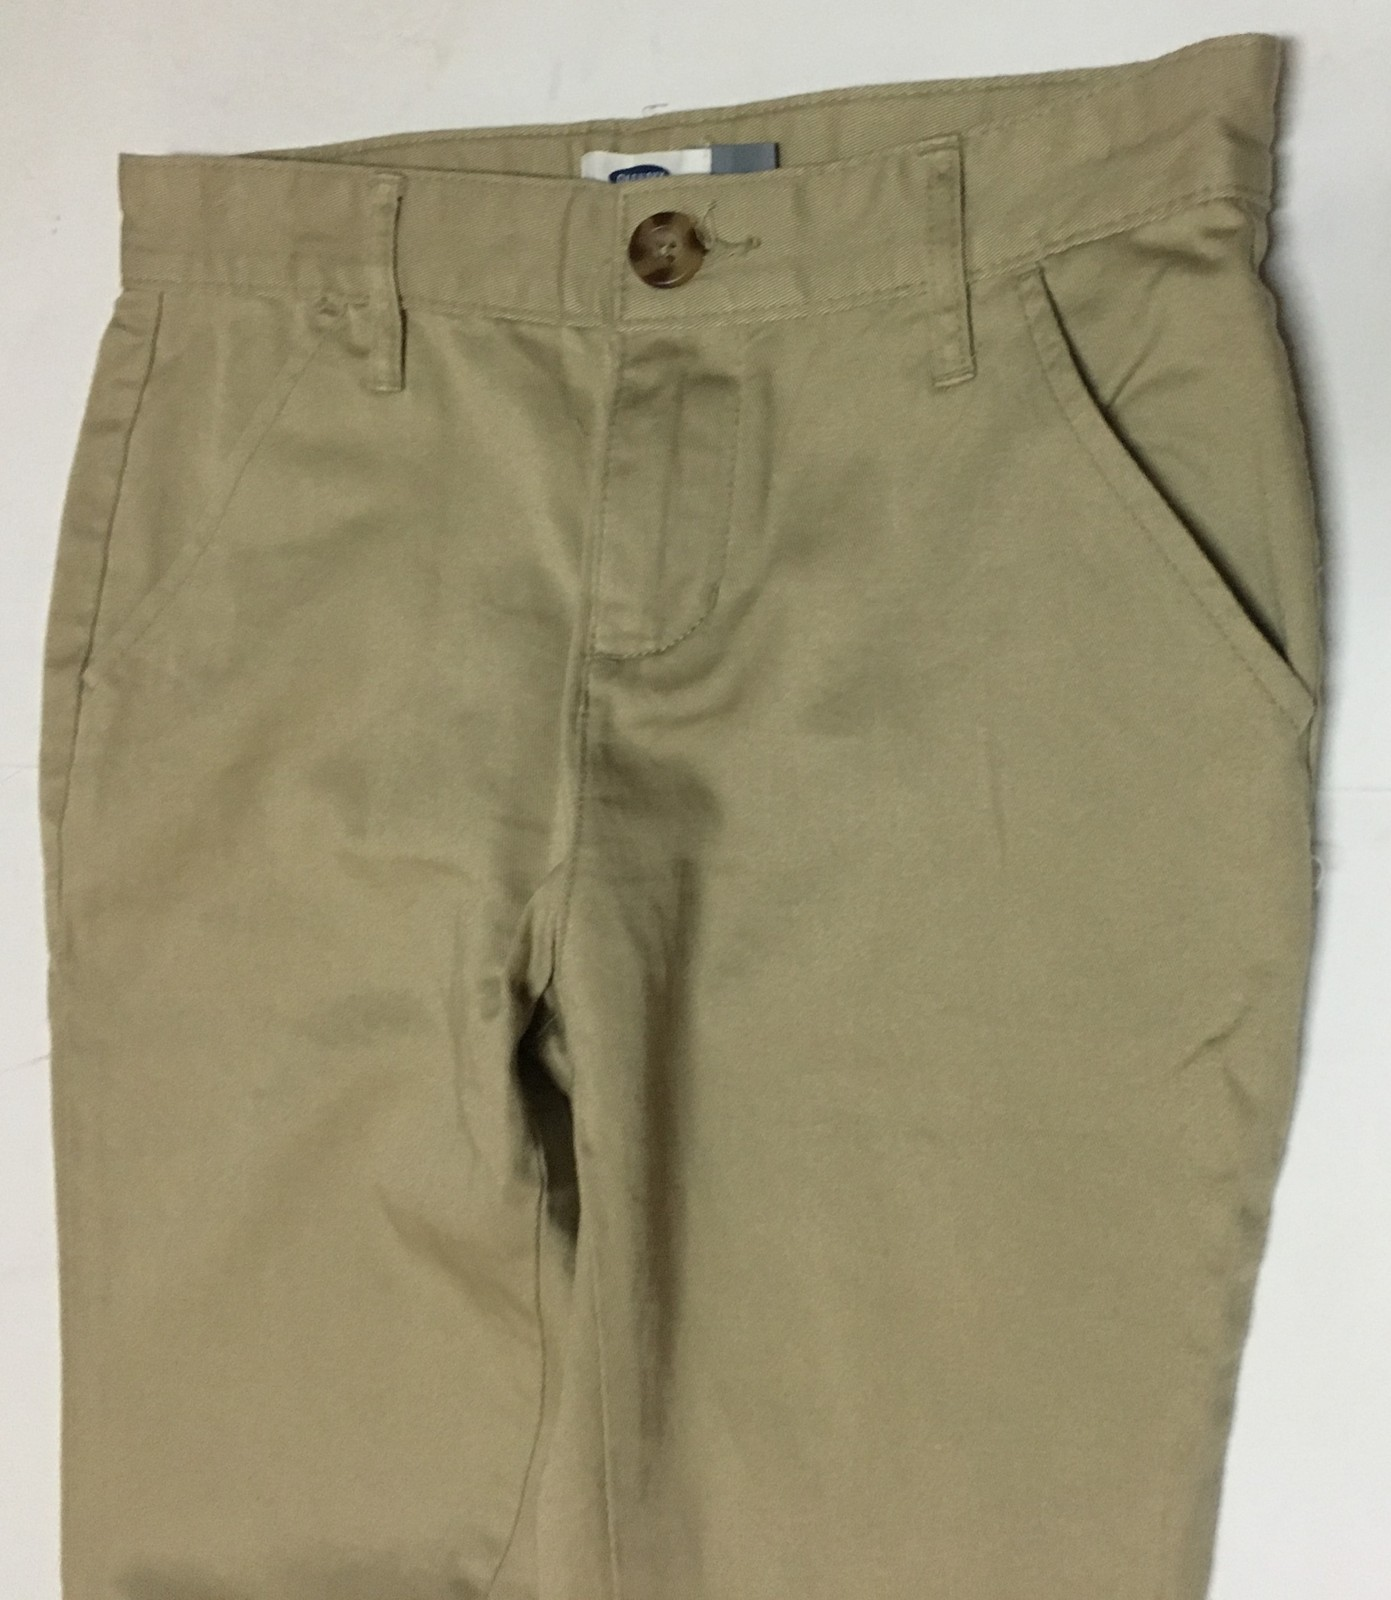 Girl's Old Navy Beige Khaki Pants Sz 14 Slim Skinny Stretch Youth